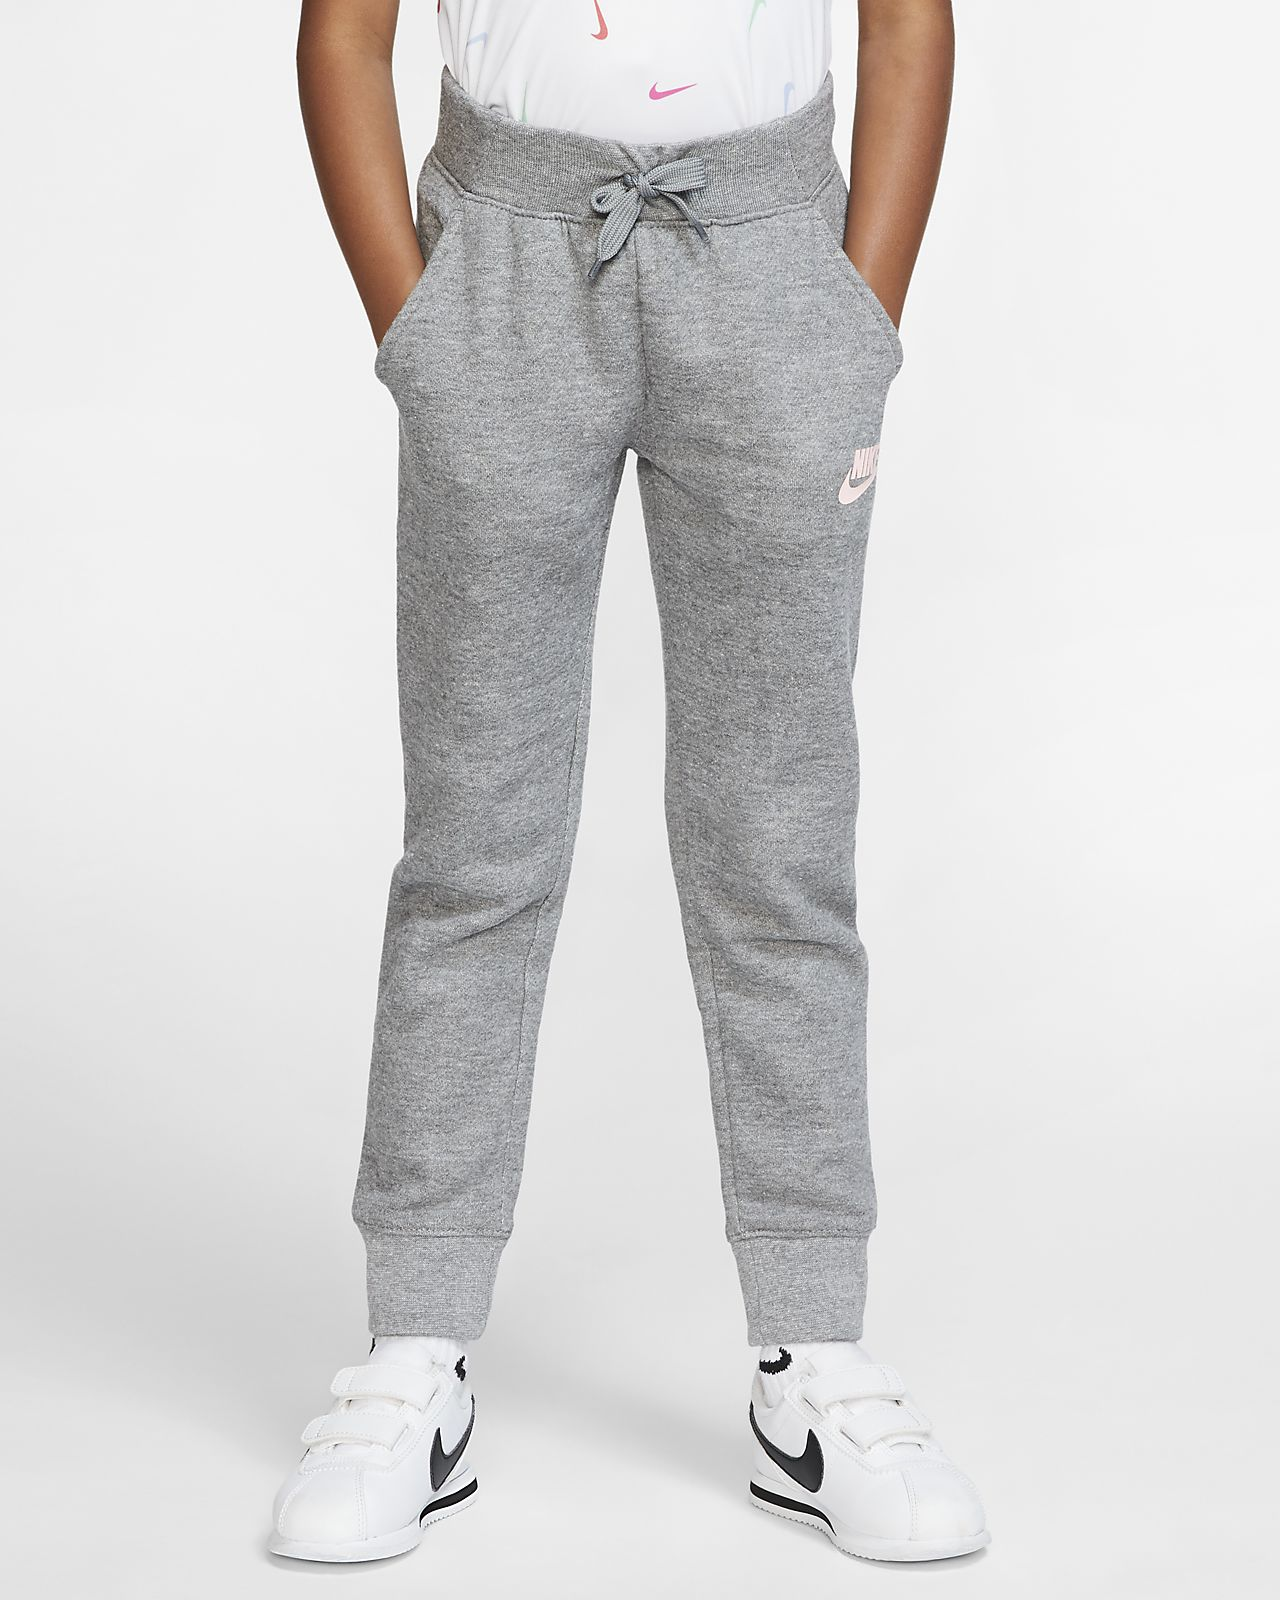 Nike Sportswear Fleece-Jogger für jüngere Kinder